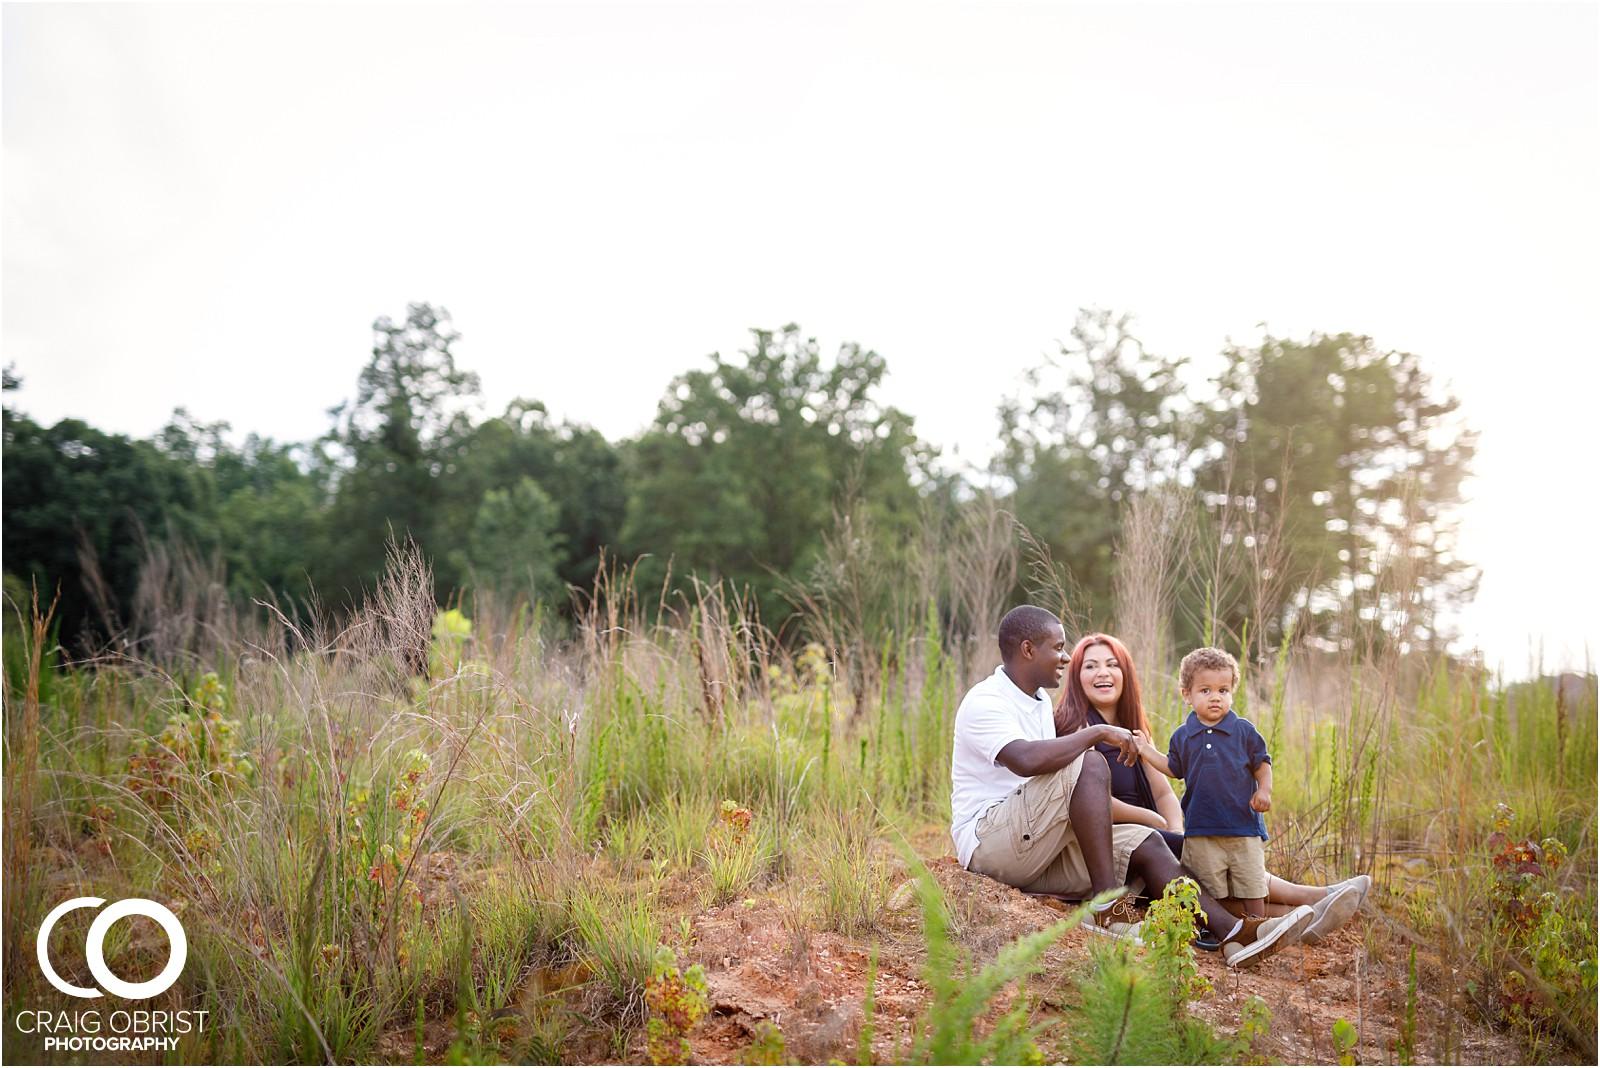 Grass Field Family Portratis Sunset Atlanta_0026.jpg